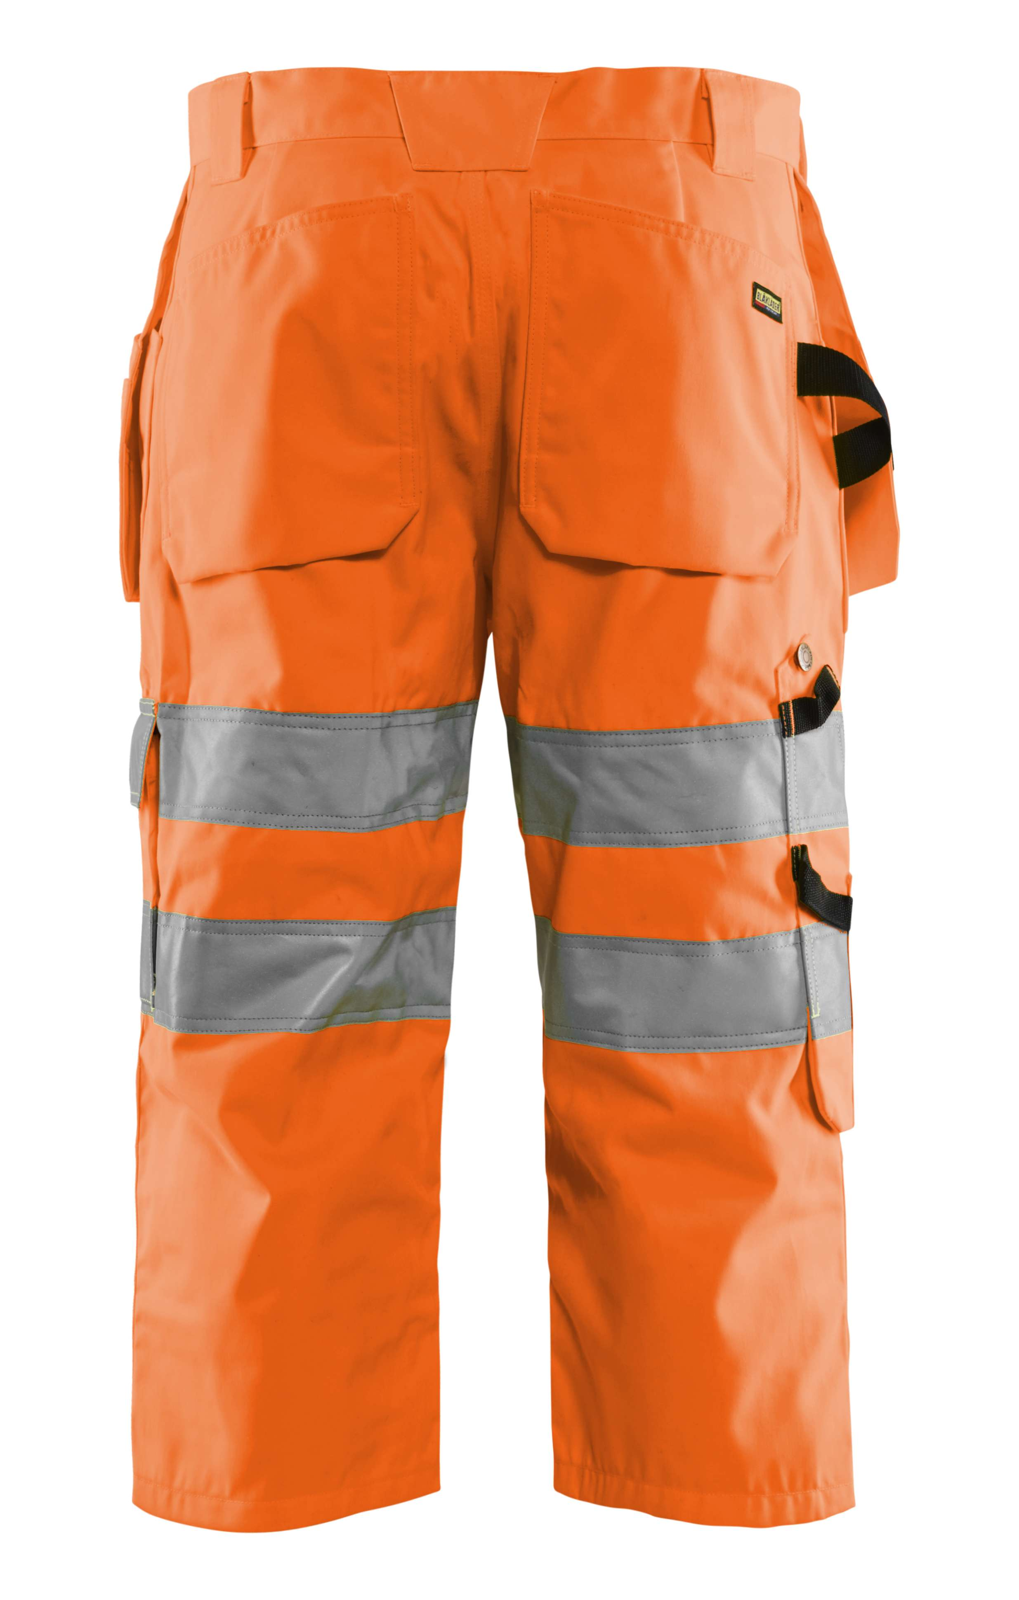 Blaklader Piraatbroeken 15391804 High Vis oranje(5300)